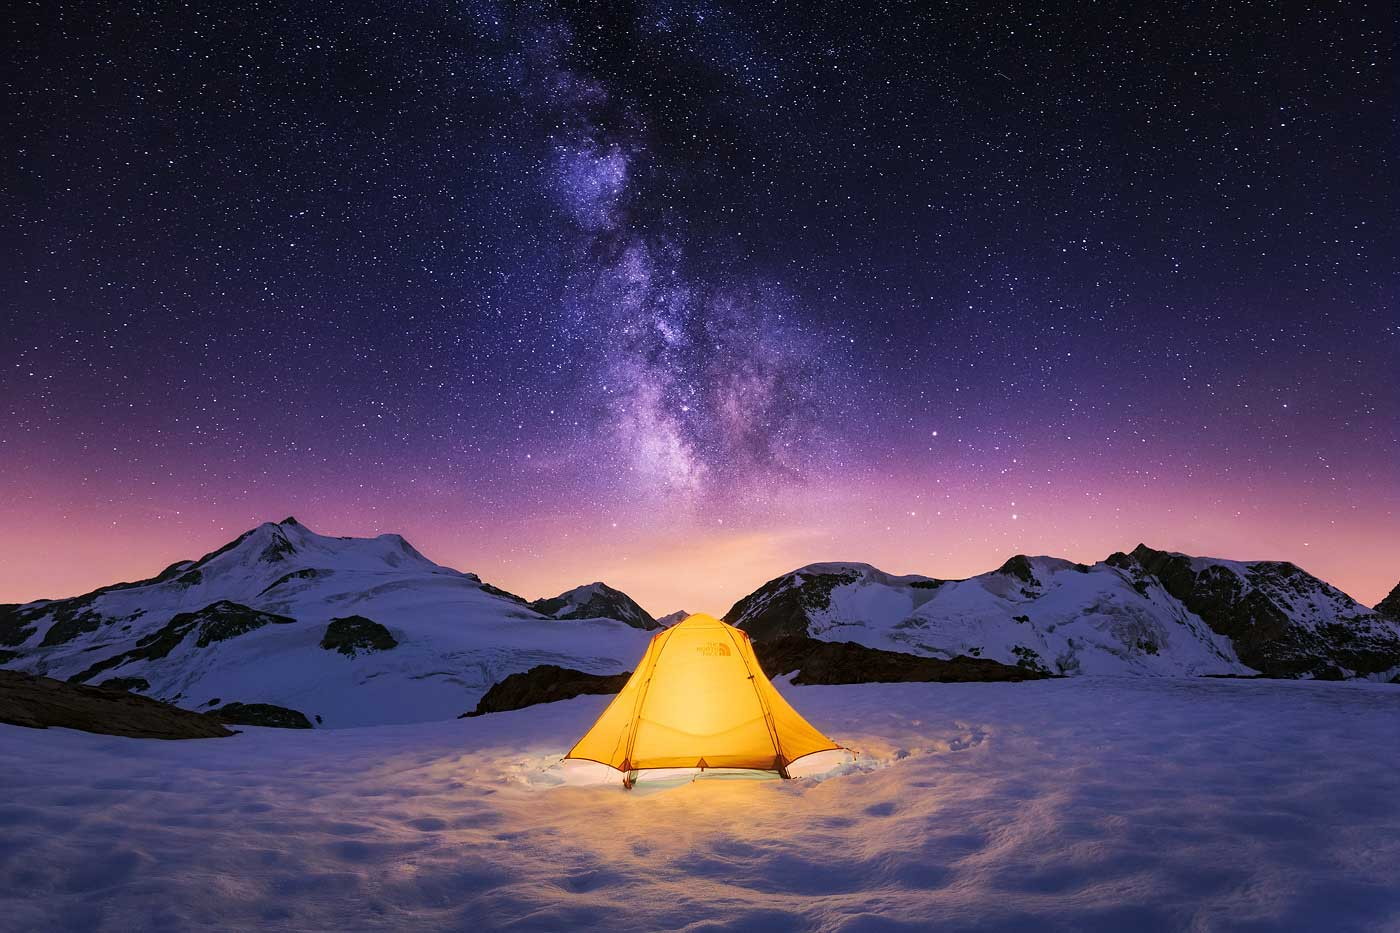 Fotografie: Lukas Furlan Lukas-Furlan-Fotografie-Alpen_01